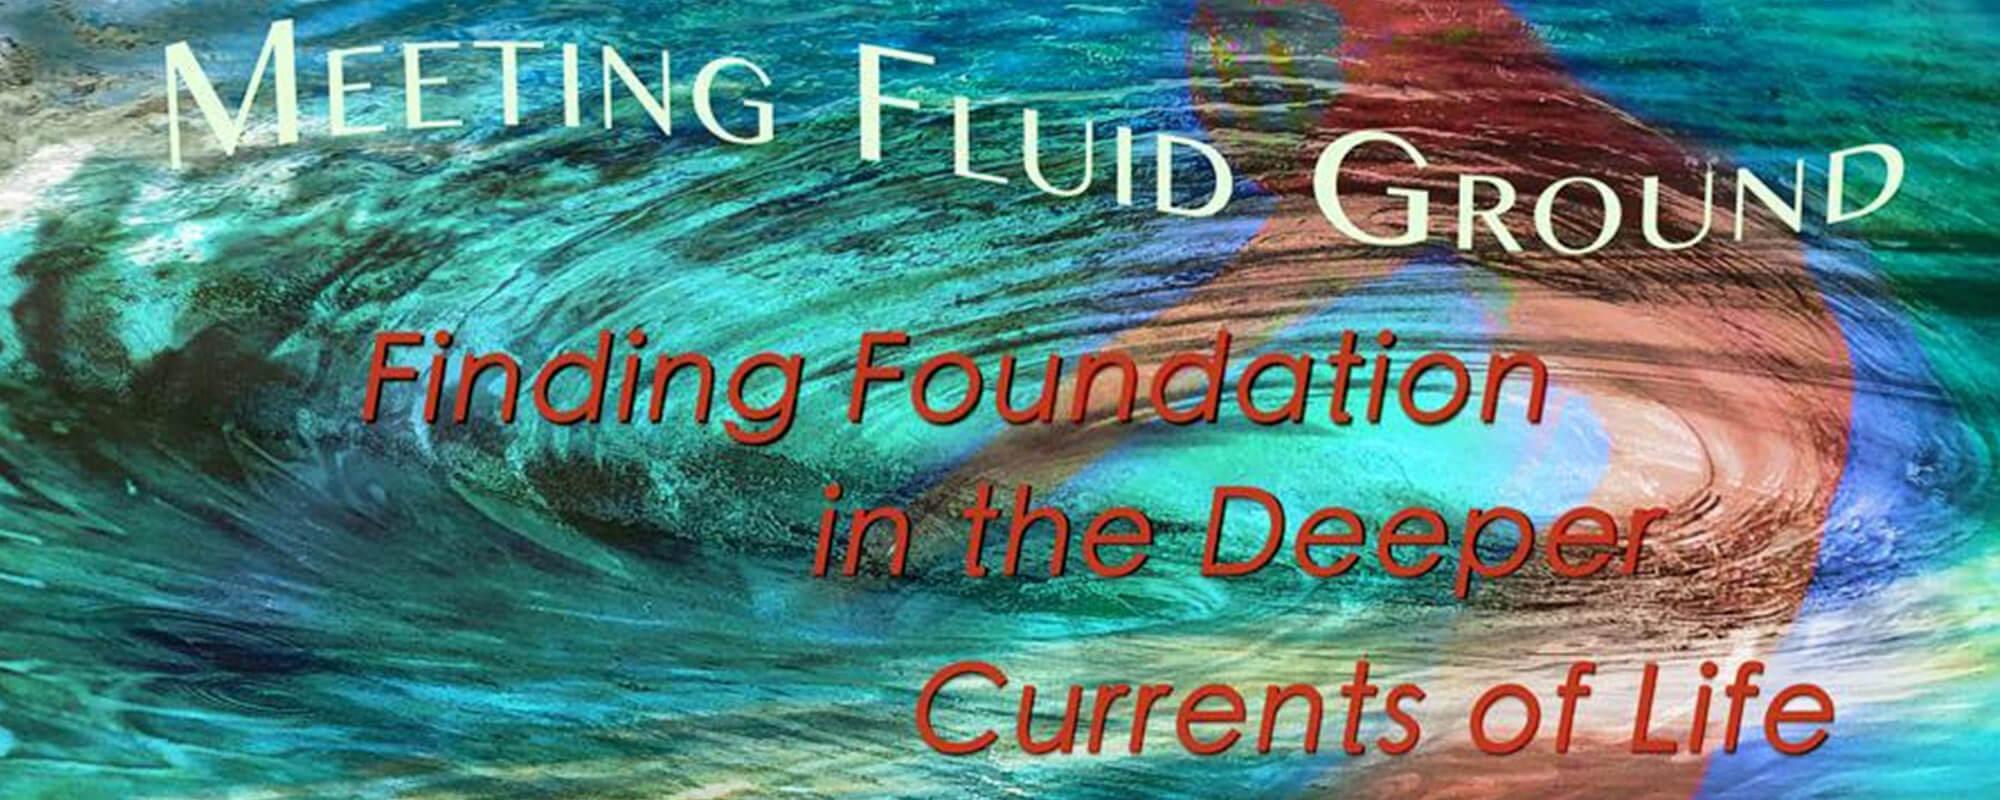 Meeting Fluid Ground